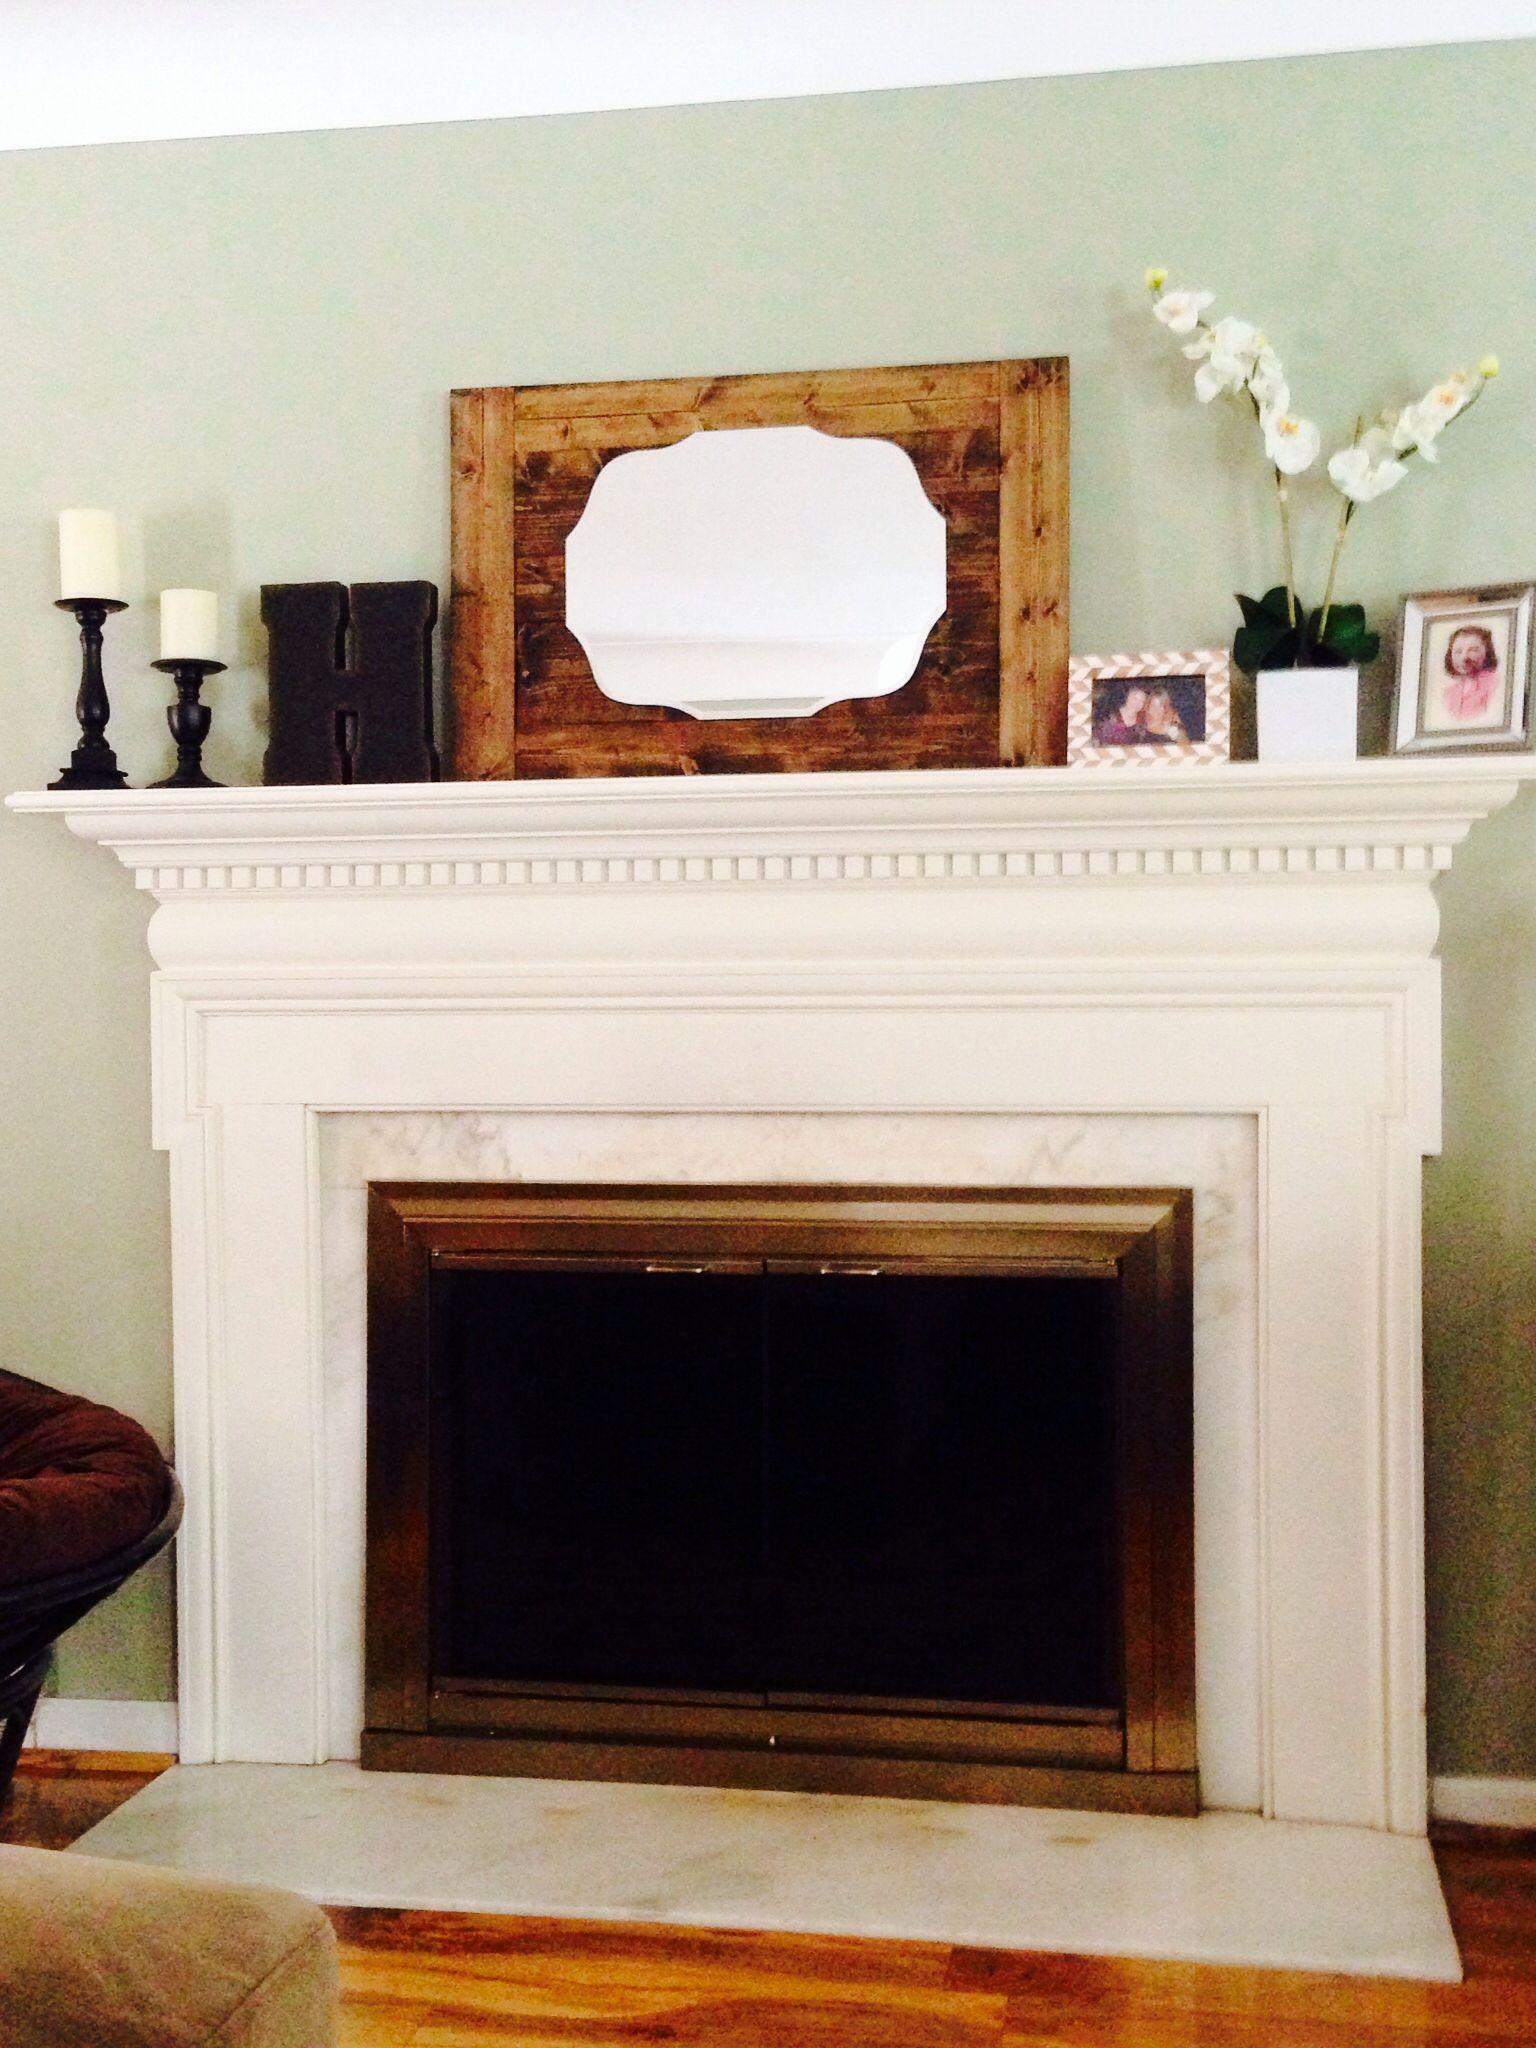 Fireplace Mantle Decor Mirror Dream Home Pinterest